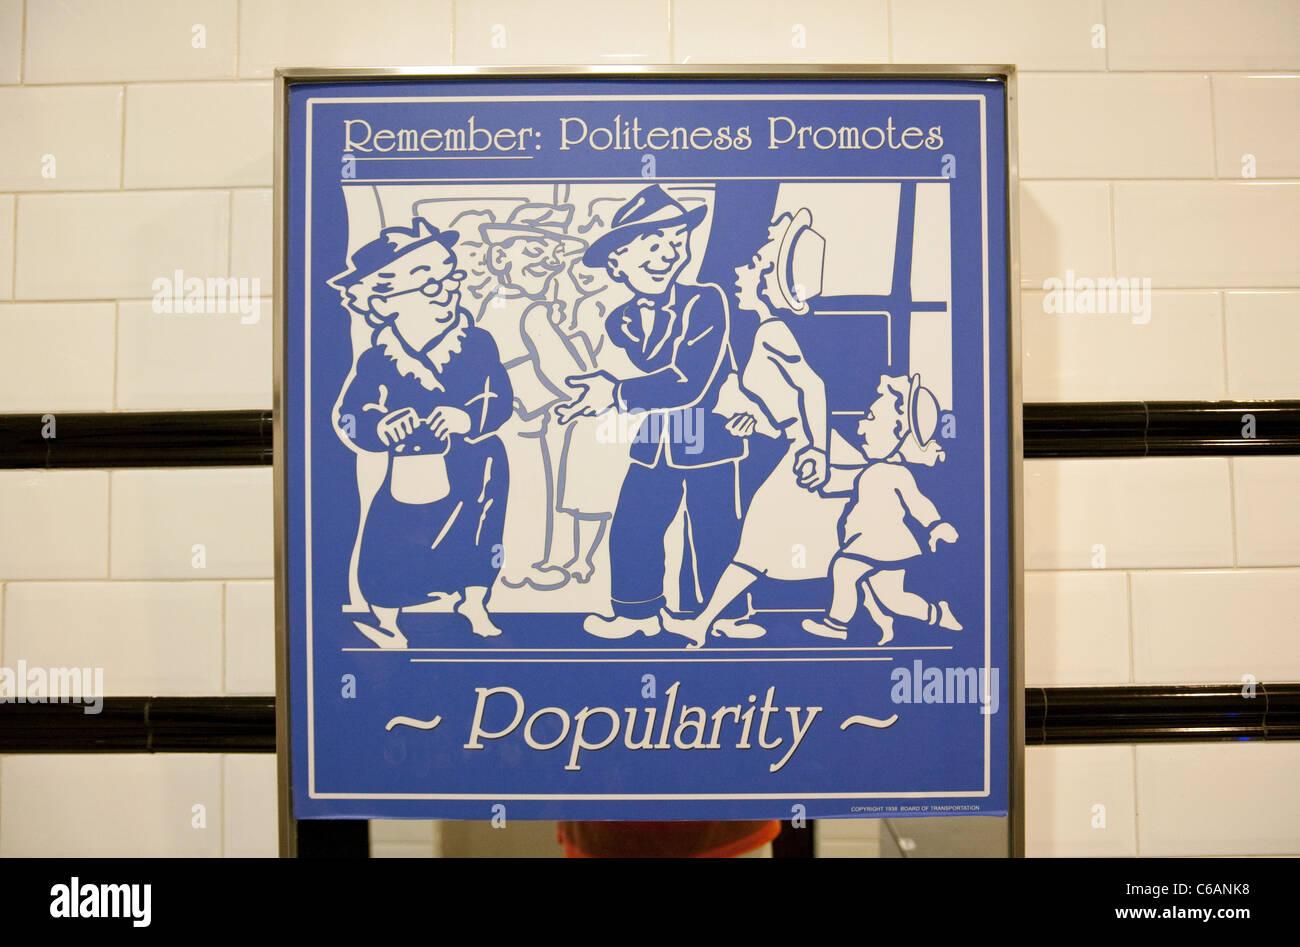 Politeness promotes popularity poster, Universal Studios, Singapore Stock Photo